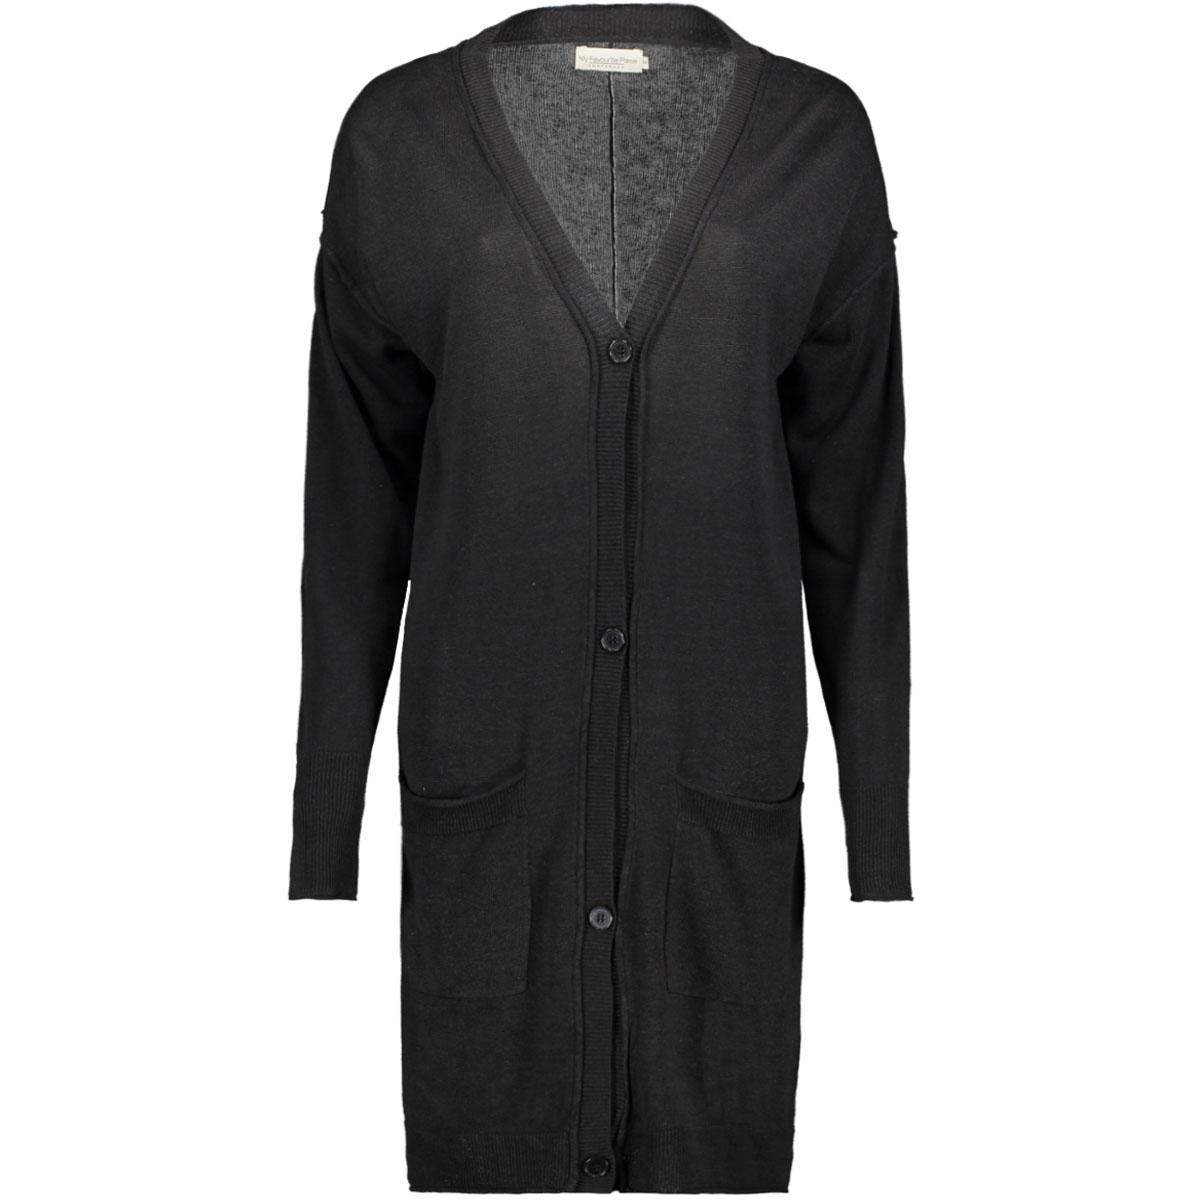 lisa cardigan 99040203 my favourite piece vest nearly black